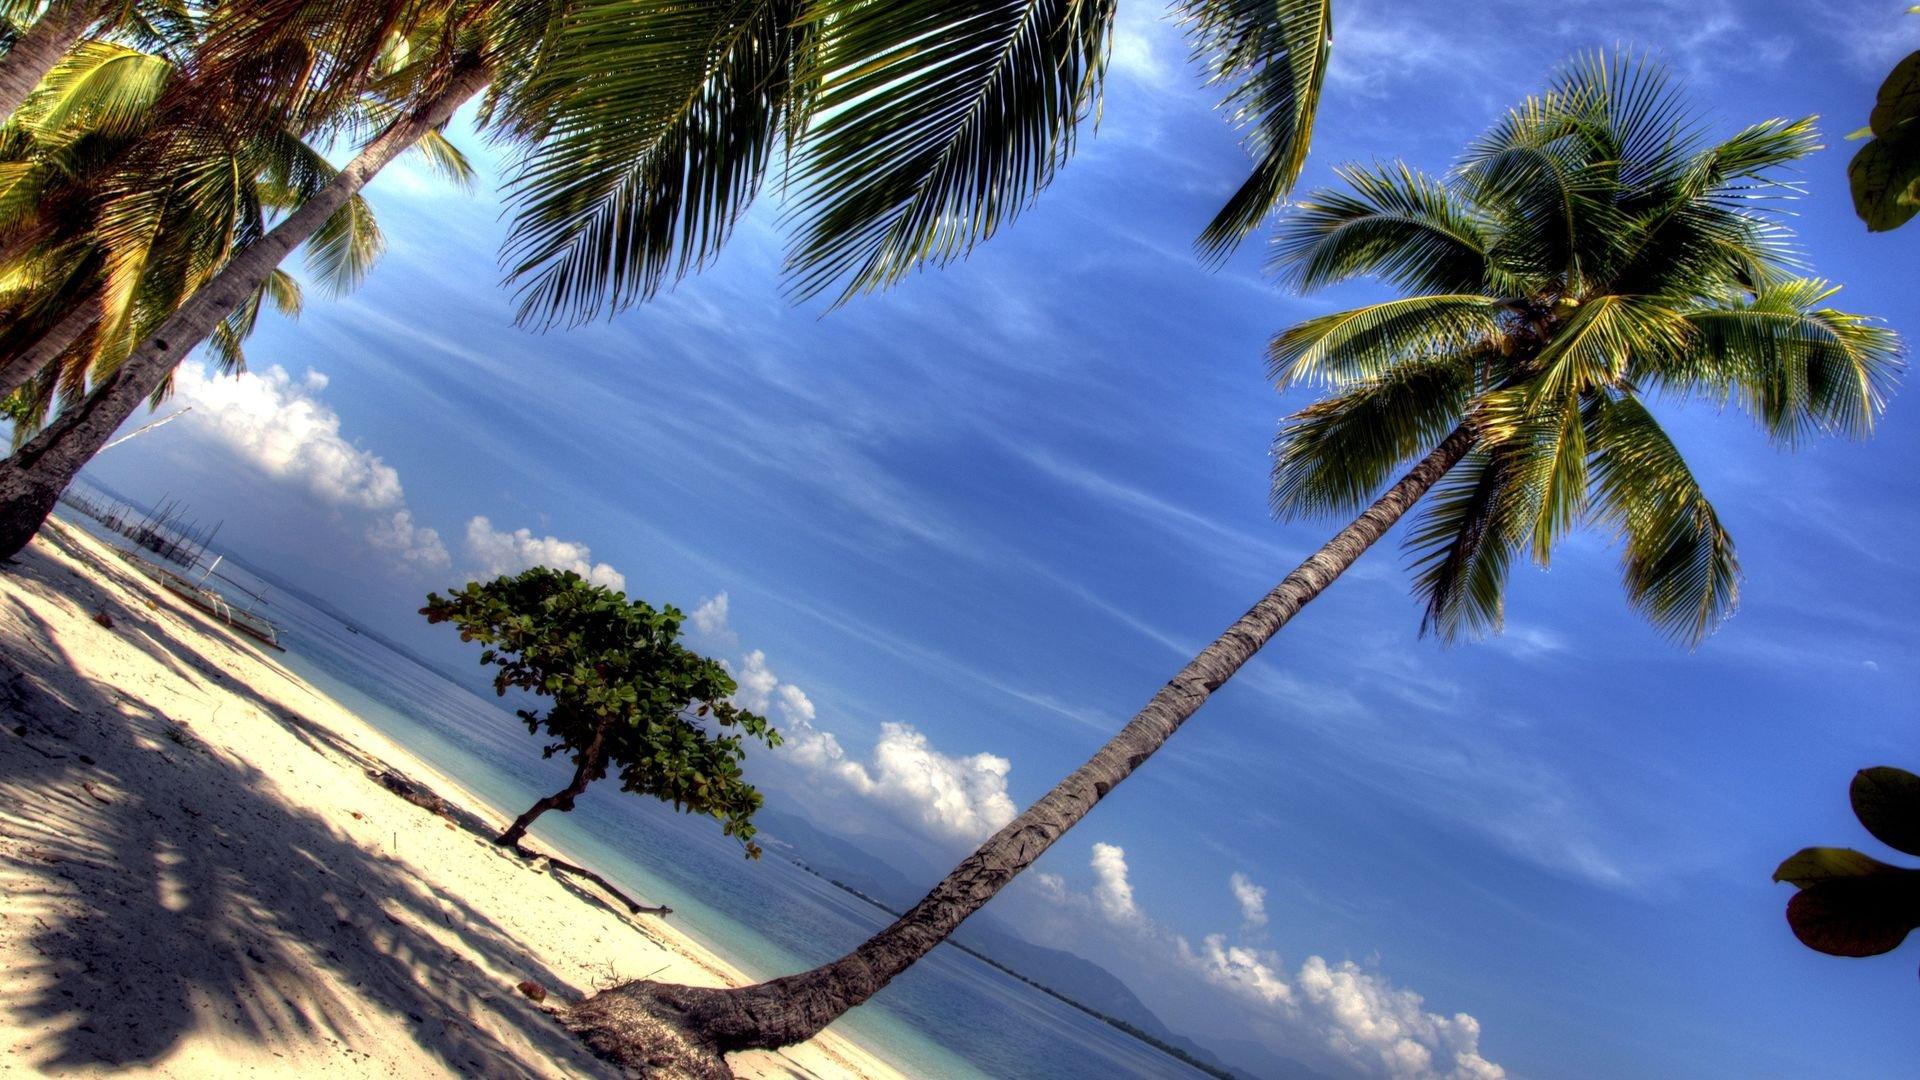 Palm Tree Screensaver hd wallpaper 1080